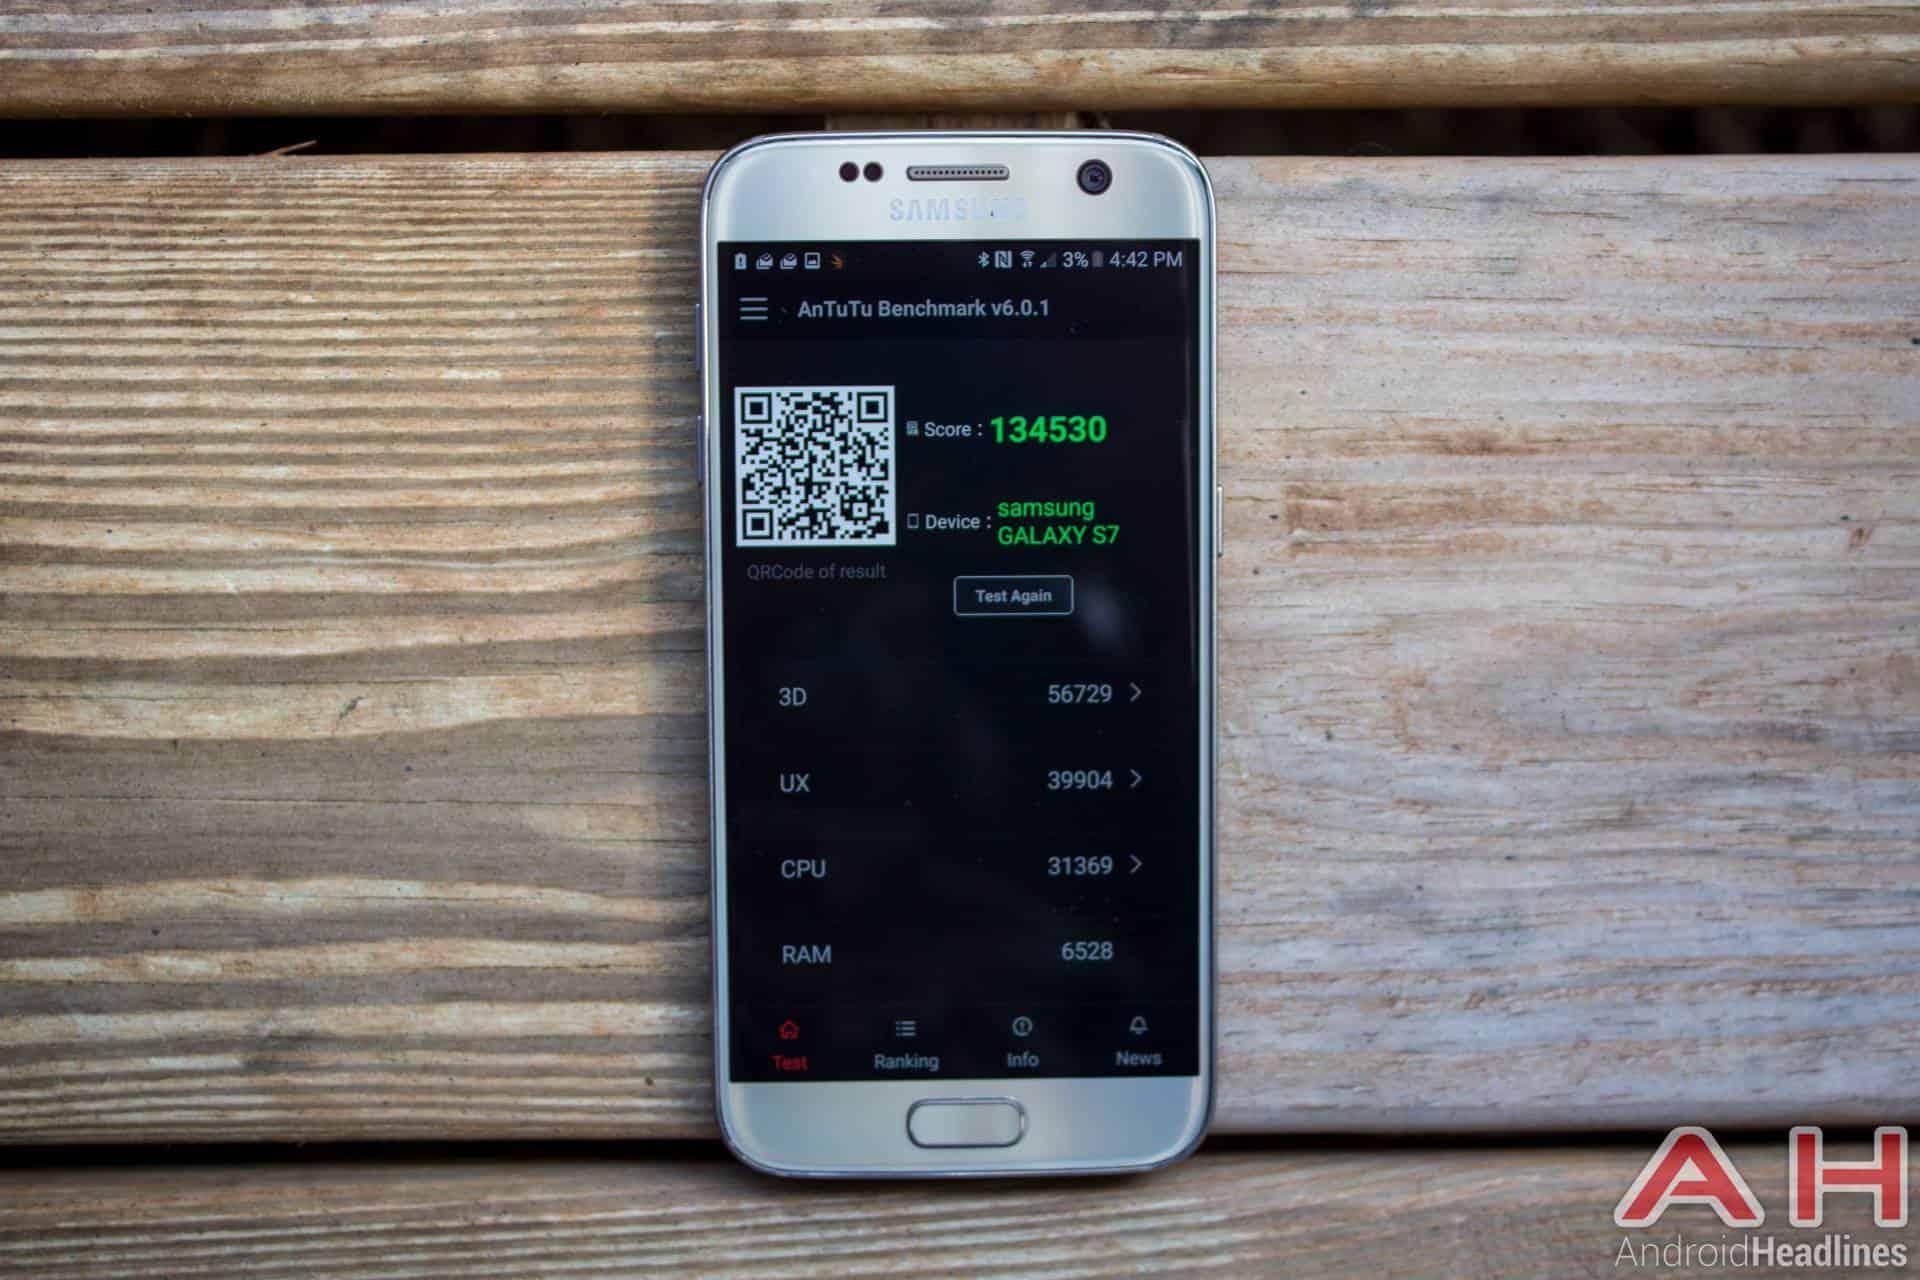 Samsung-Galaxy-S7-Gold-AH-NS-benchmarks